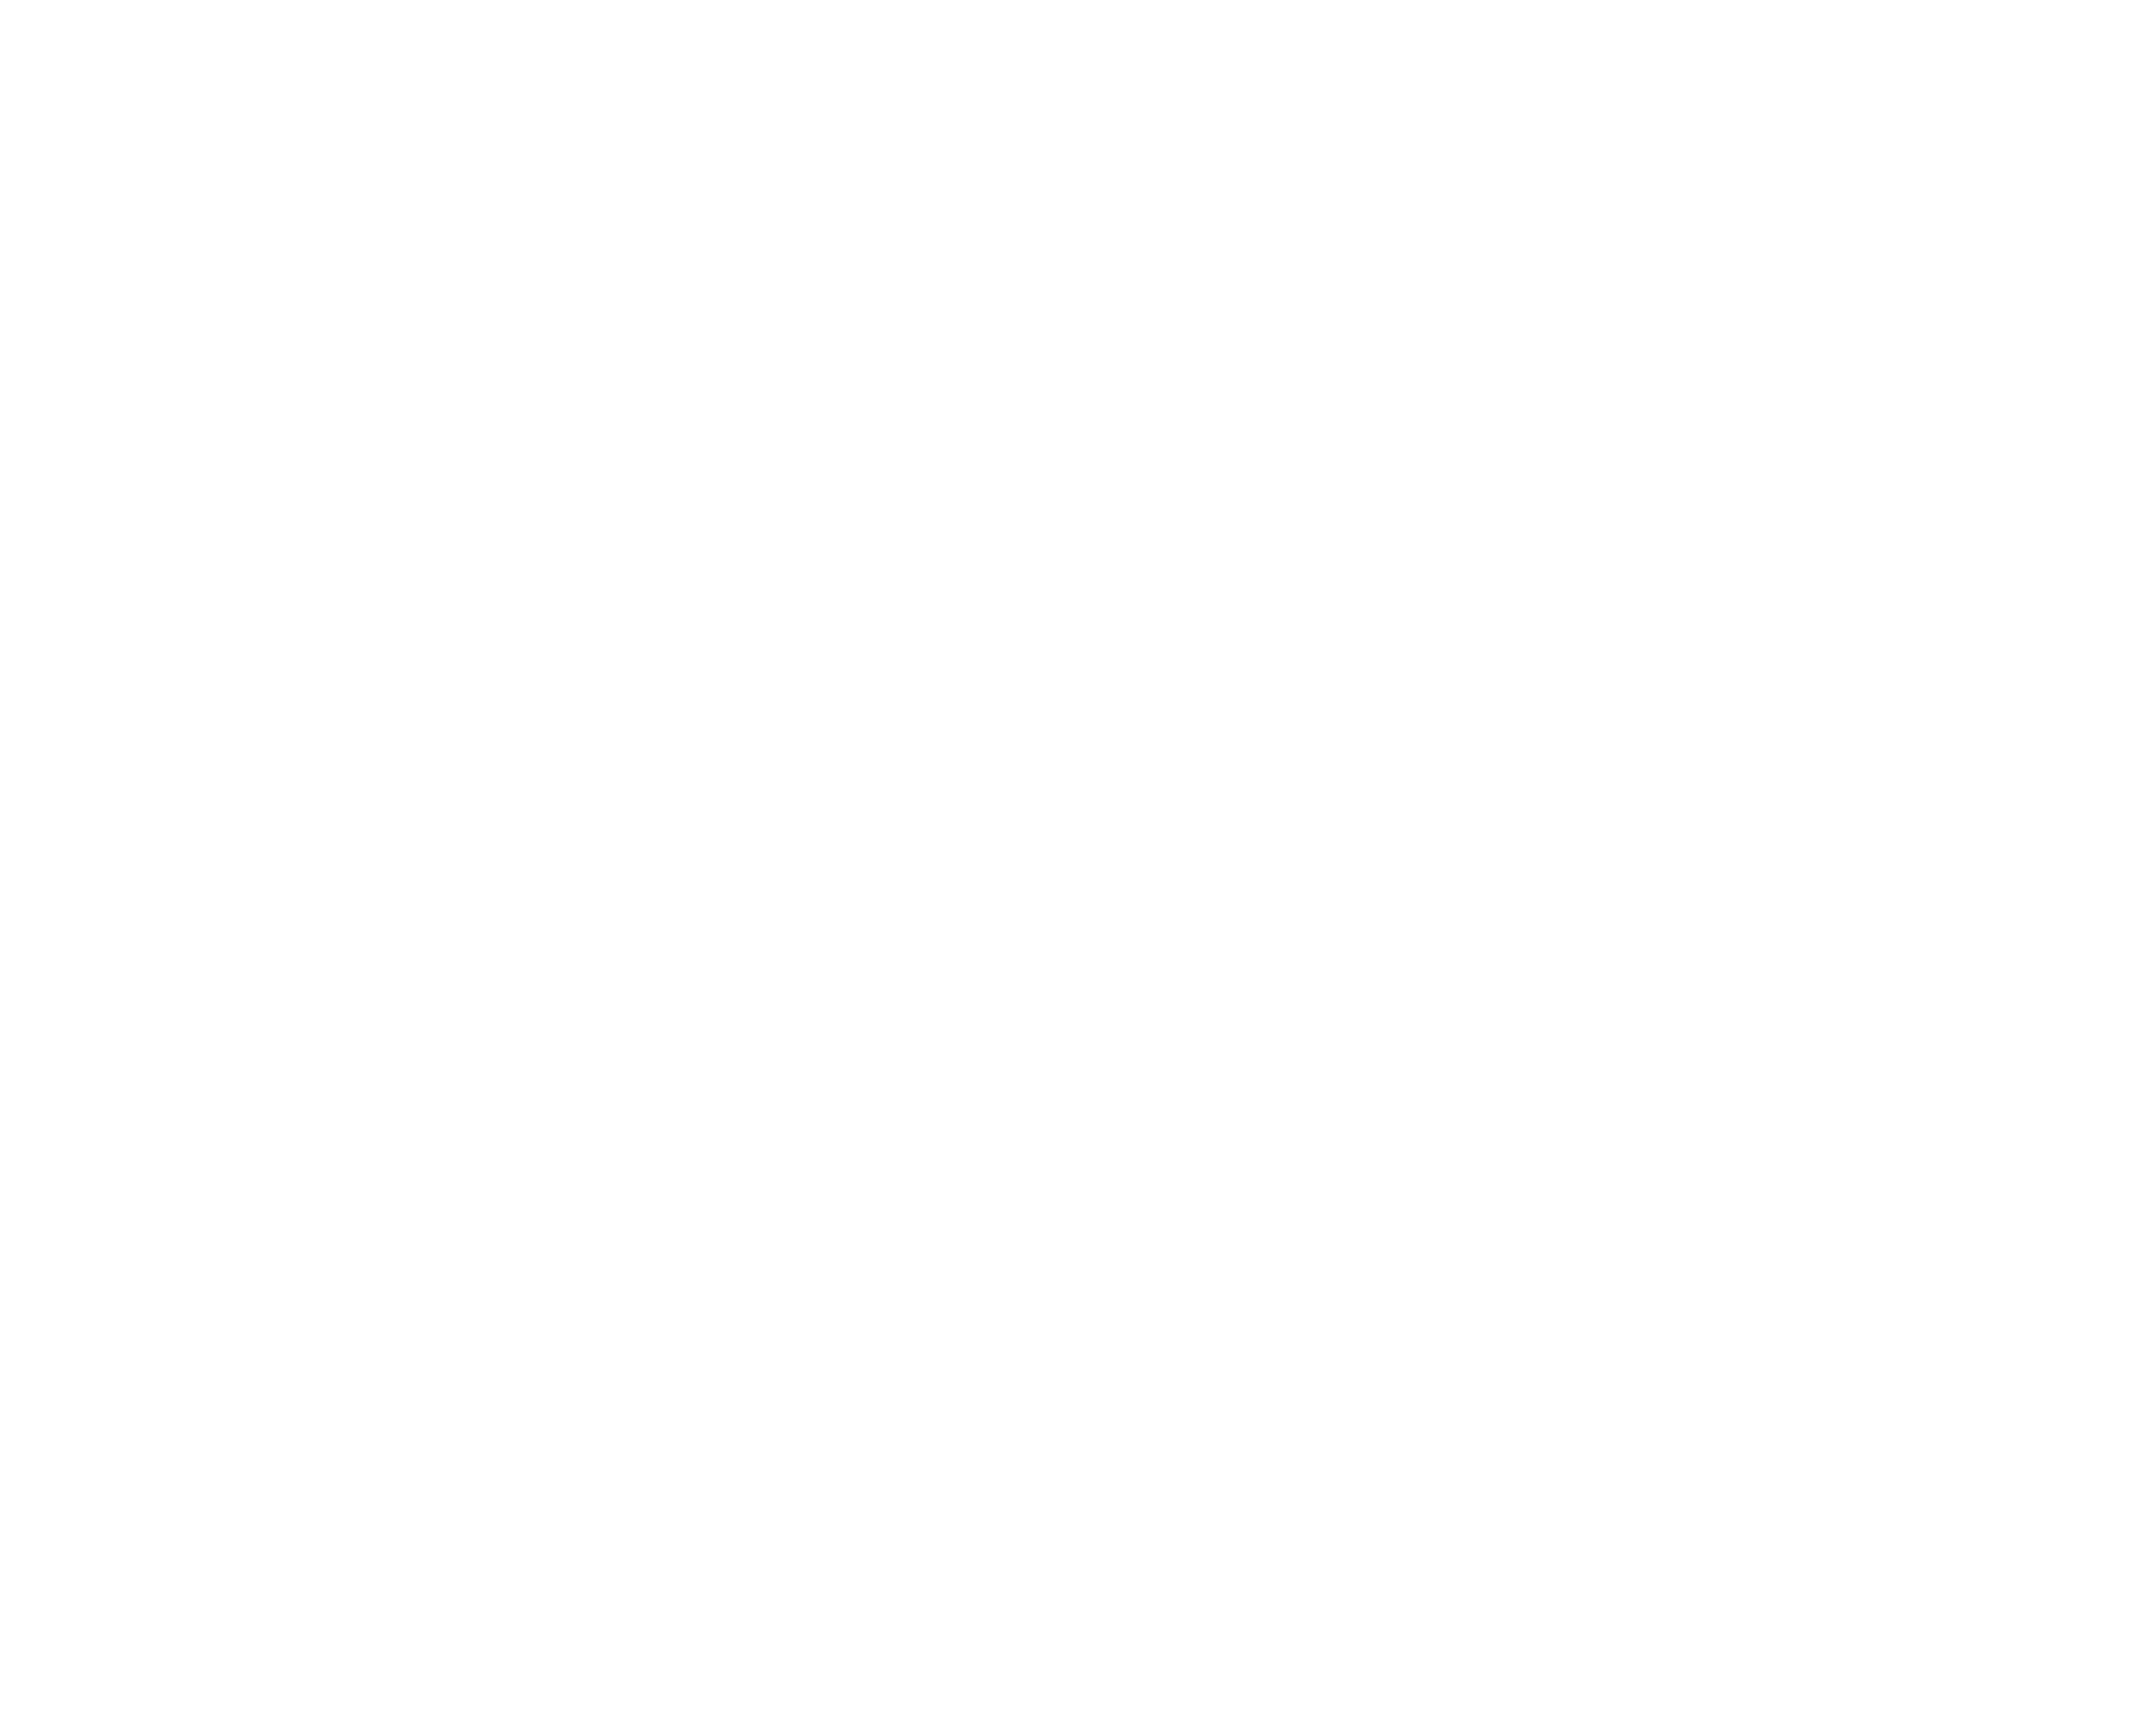 Studios iNovation